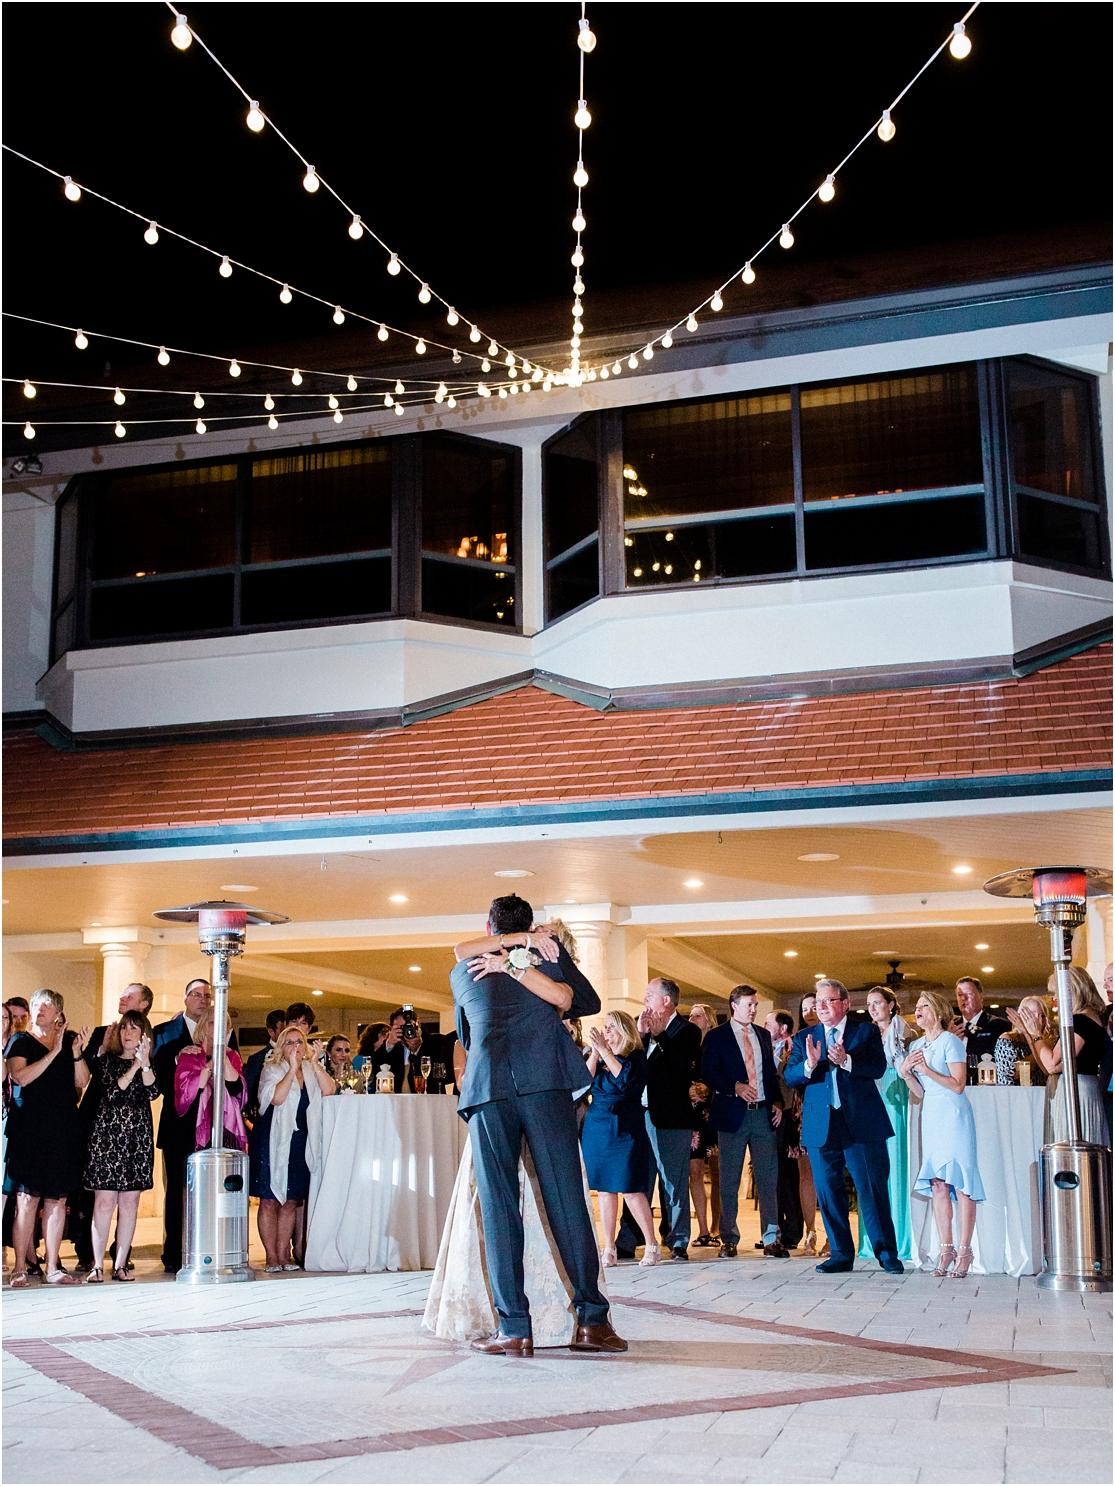 Lisa Silva Photography- Ponte Vedra Beach and Jacksonville, Florida Fine Art Film Wedding Photography- Wedding at the Ponte Vedra Inn and Club_0081.jpg